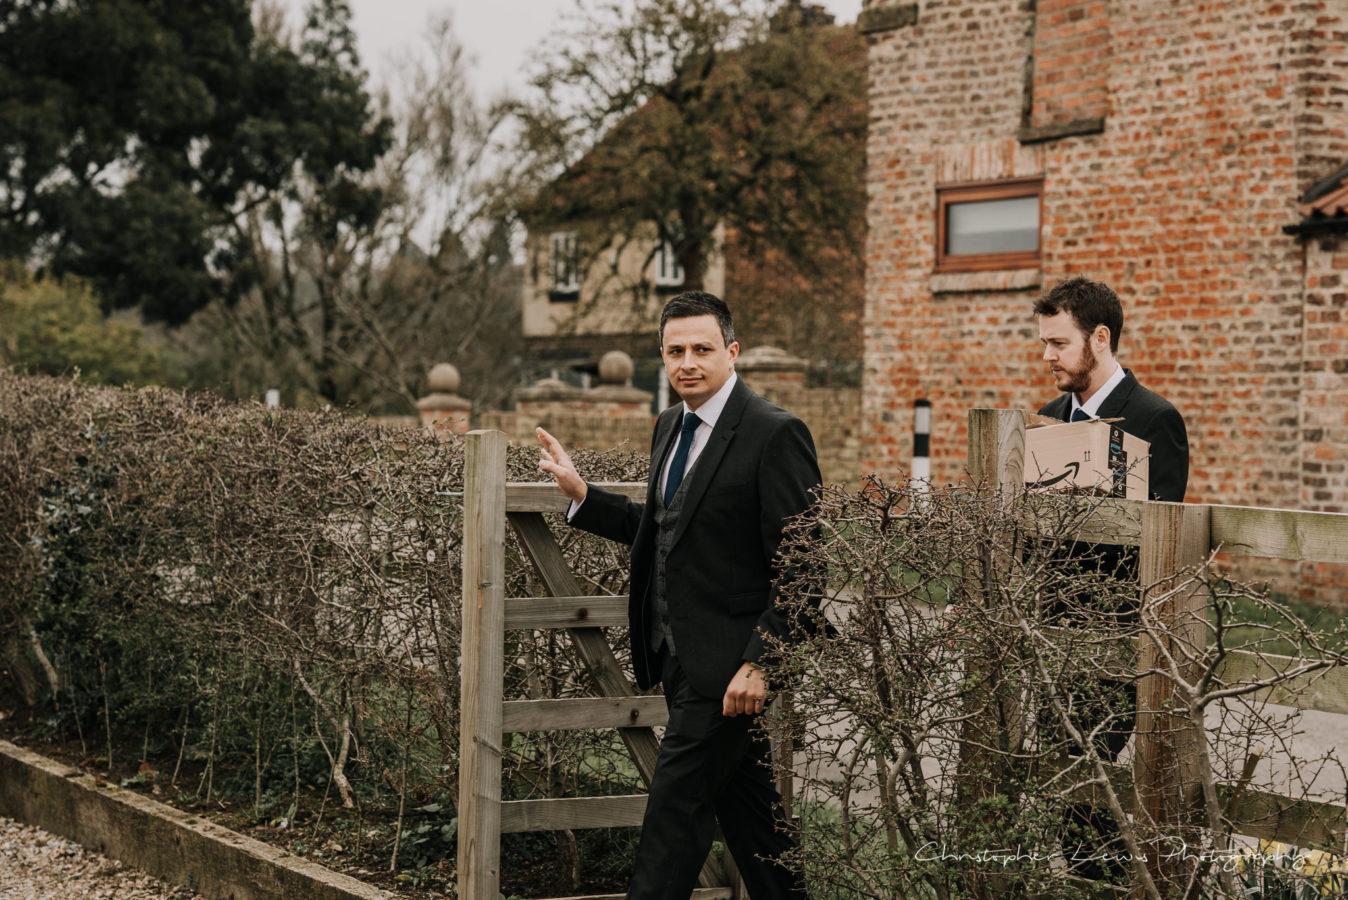 Thief-Hall-Wedding-Christopher-Lewis-Photography-9